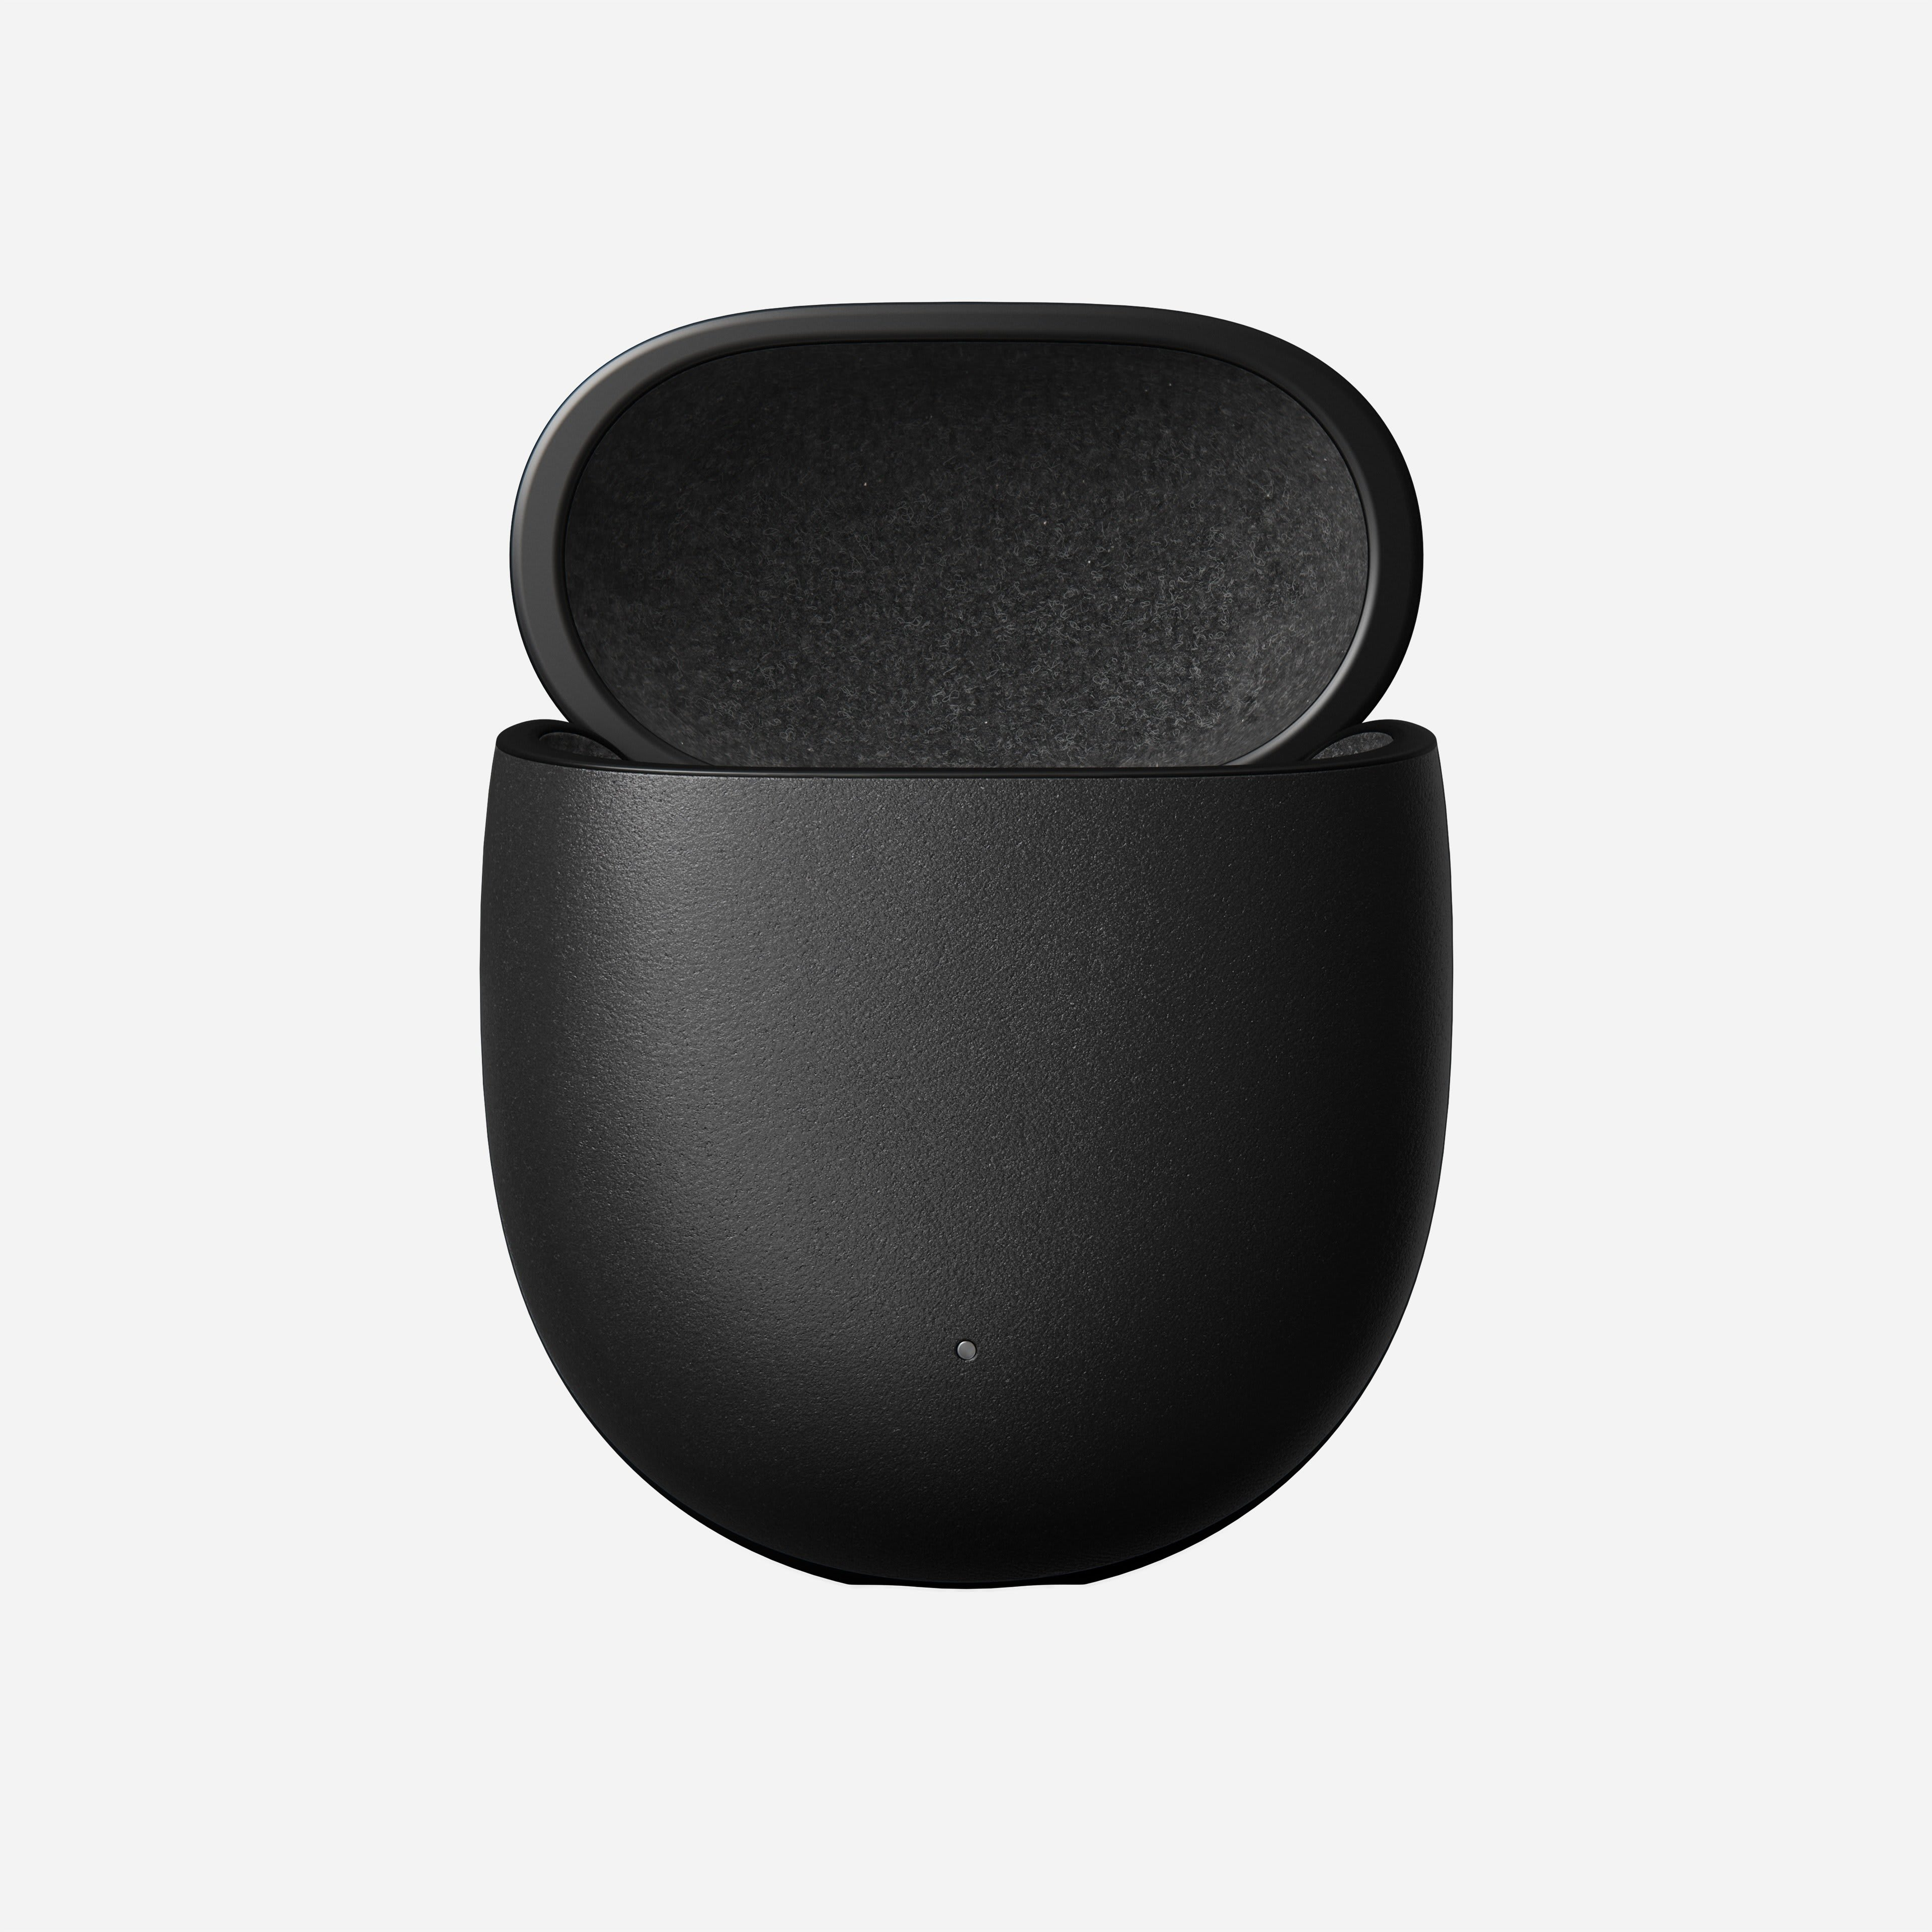 Pixel buds case black leather